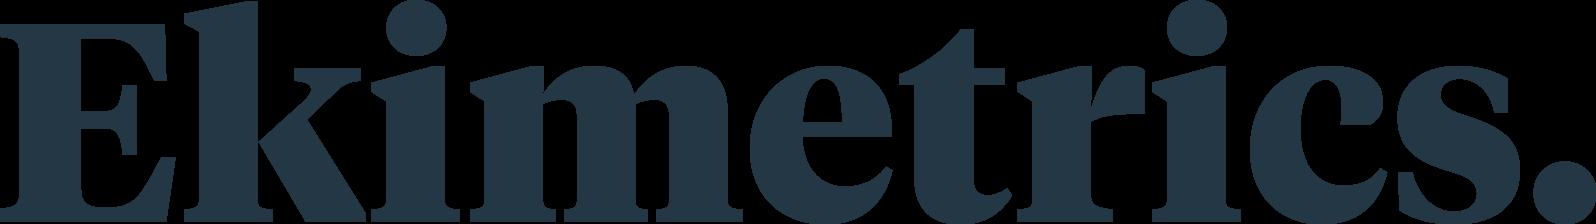 Ekimetrics logo